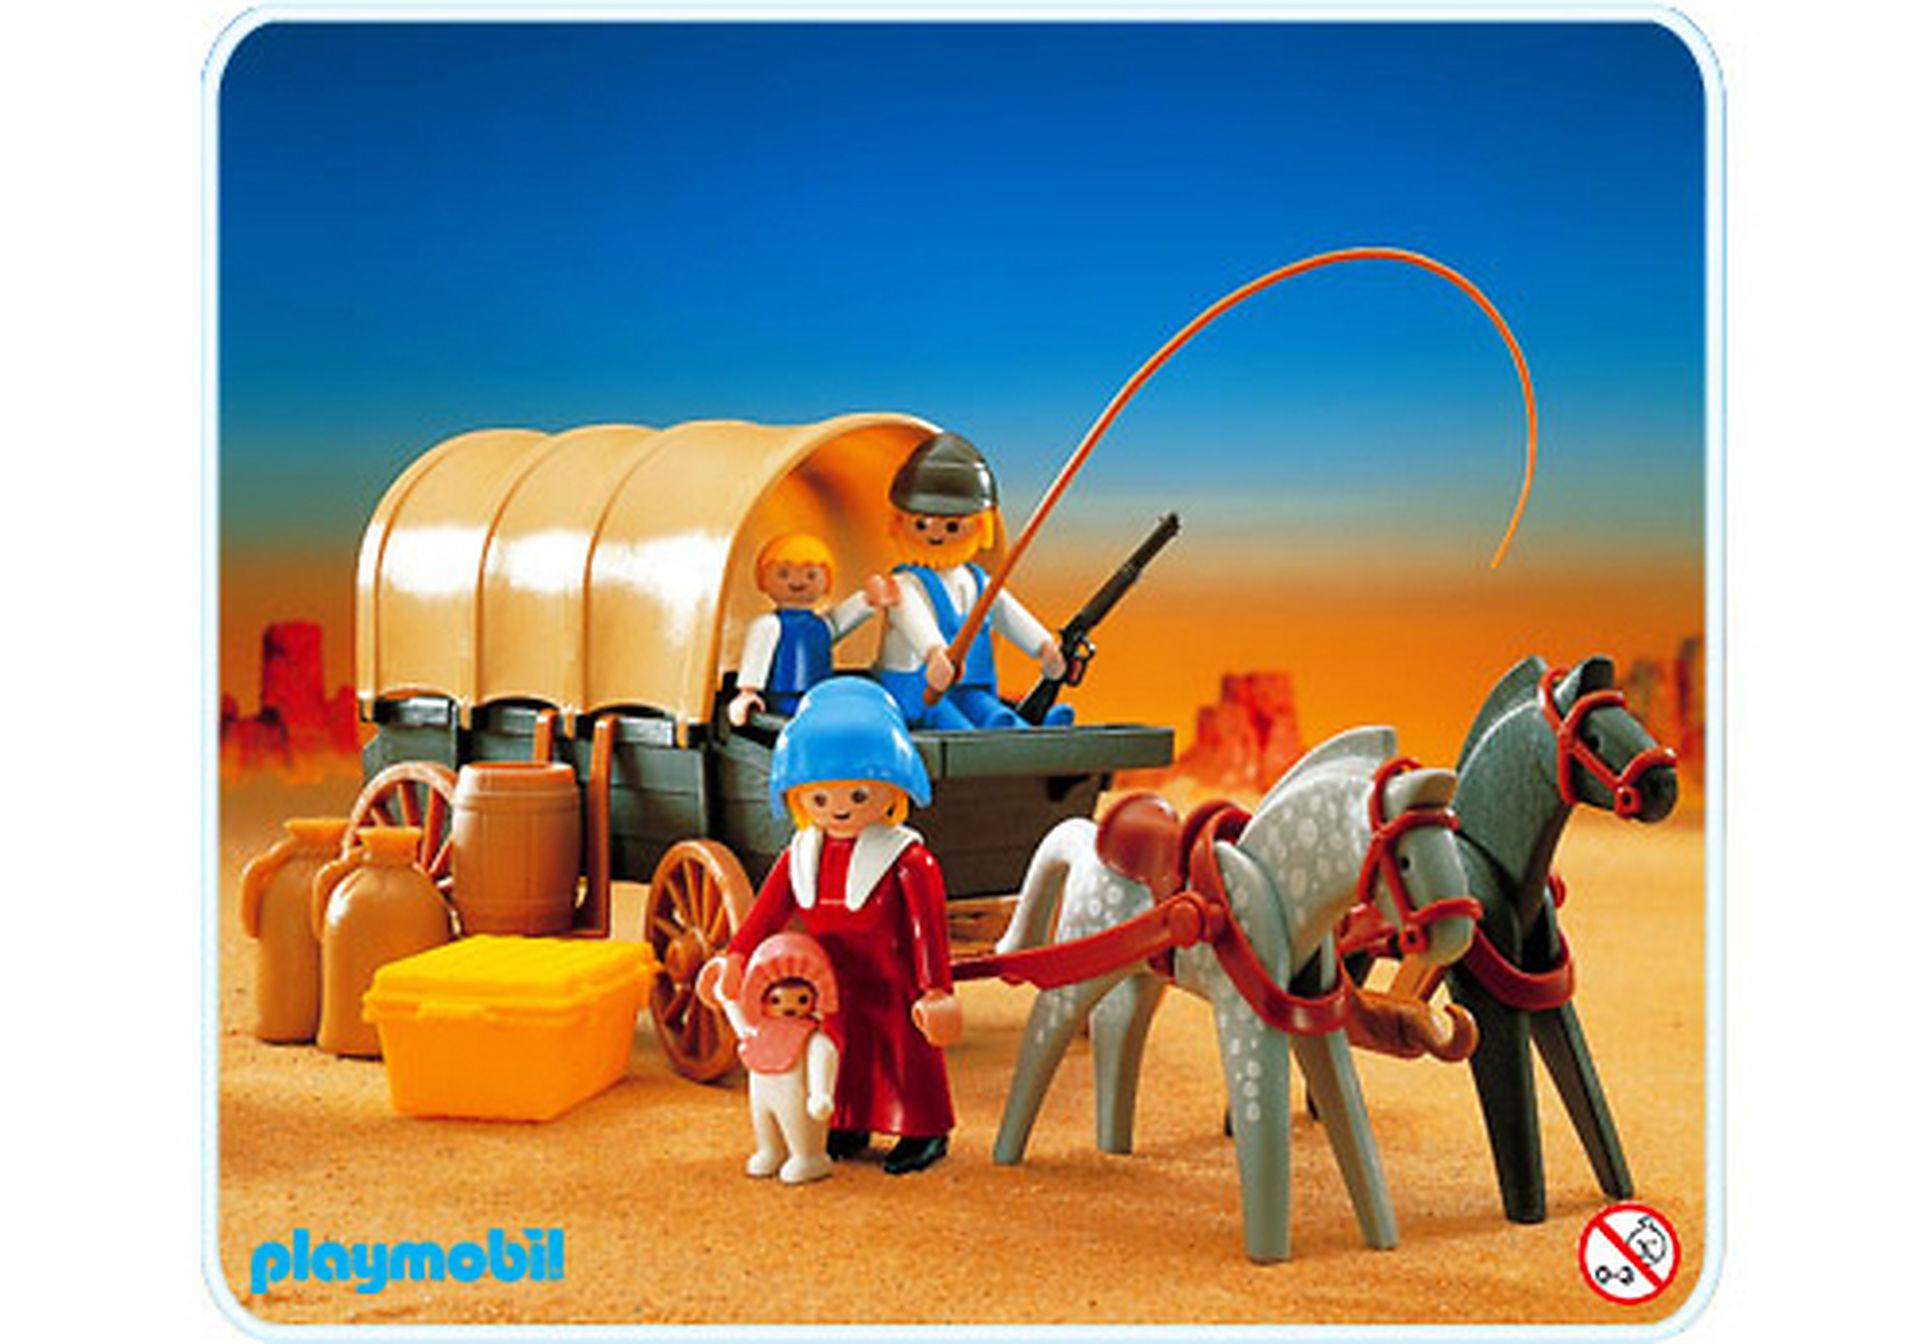 http://media.playmobil.com/i/playmobil/3278-B_product_detail/Planwagen